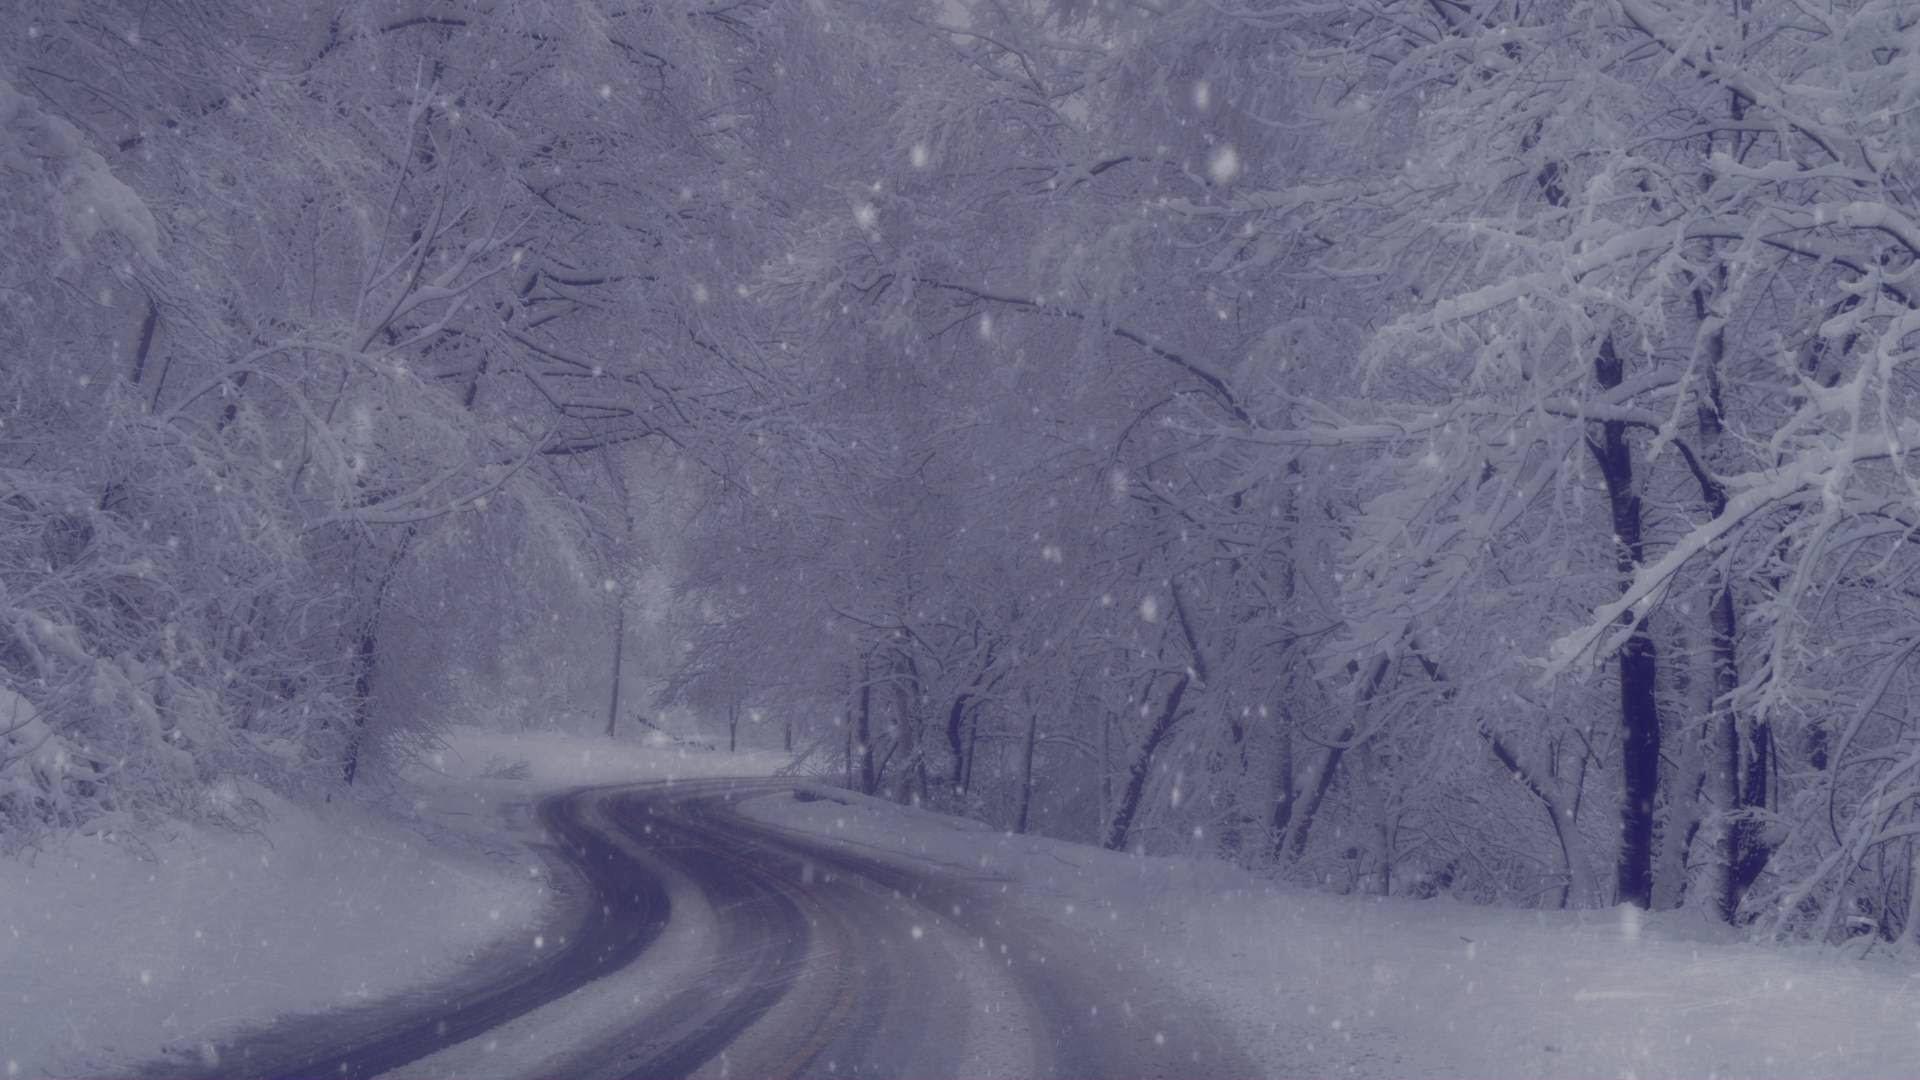 Free Falling Snow Wallpaper Download Winter Wonderland Background 44 Images